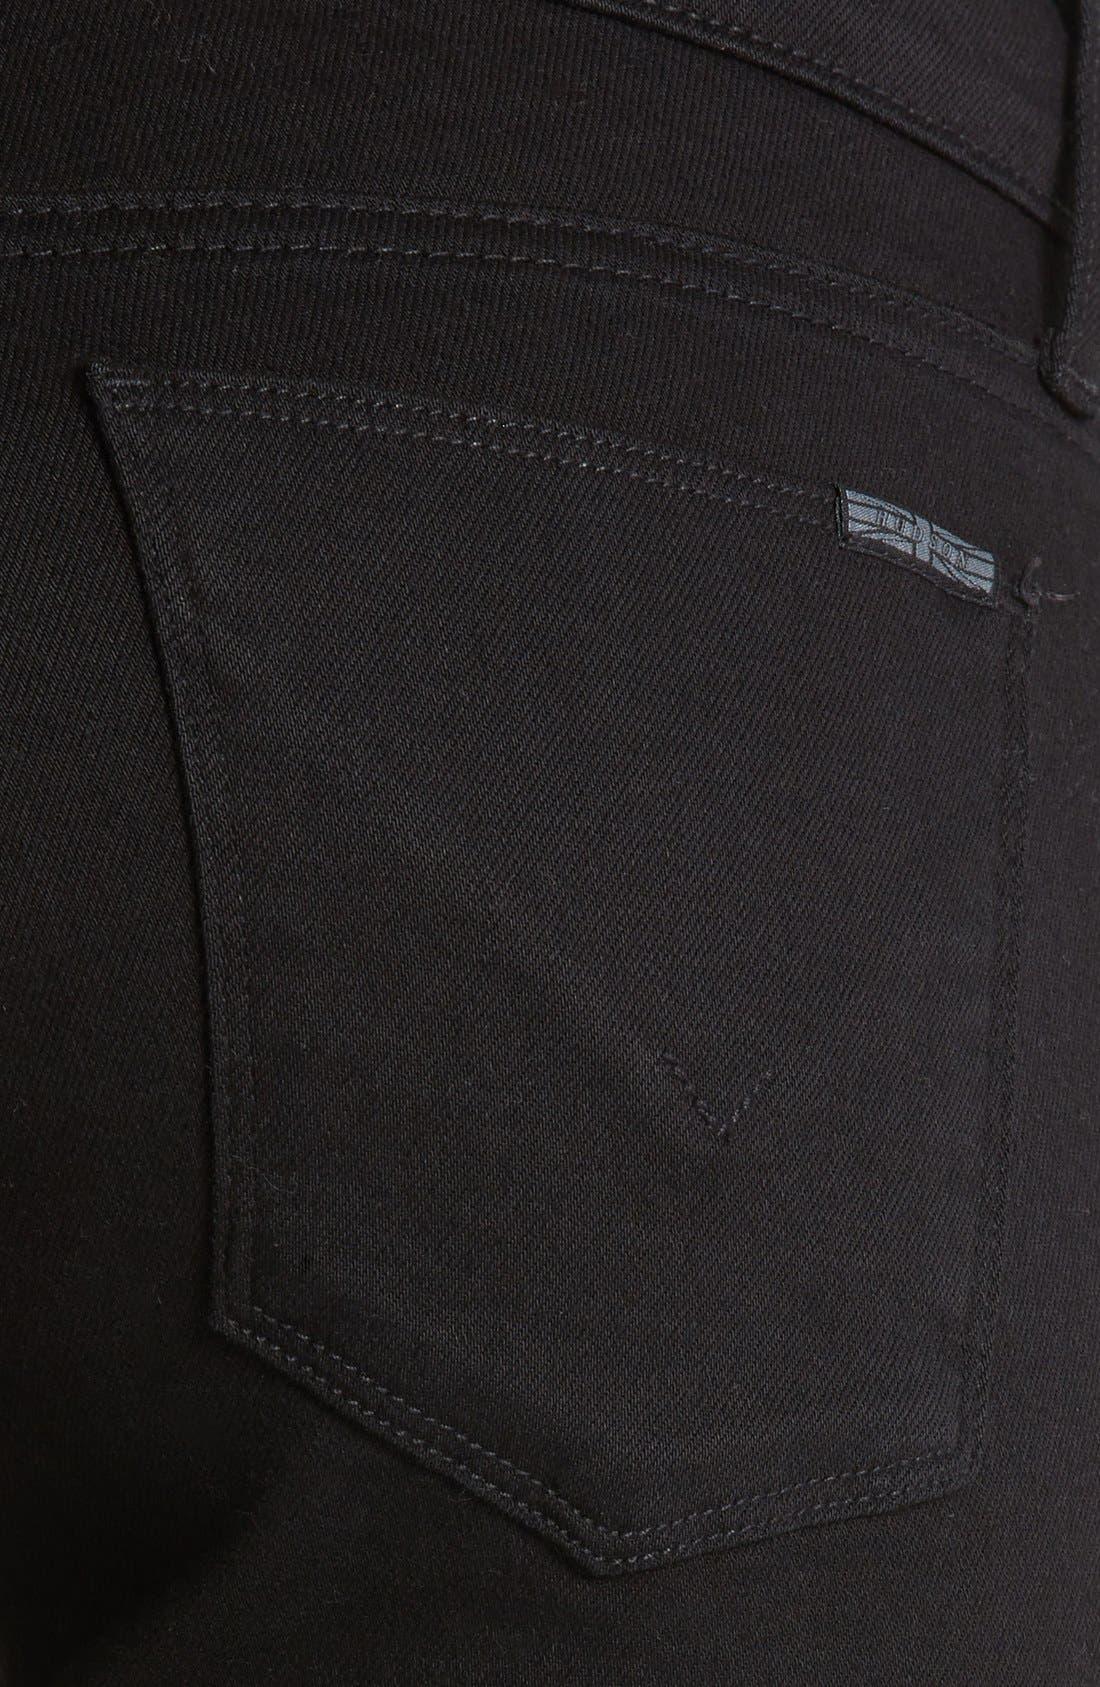 Alternate Image 3  - Hudson Jeans 'Krista Supermodel' Skinny Jeans (Black)